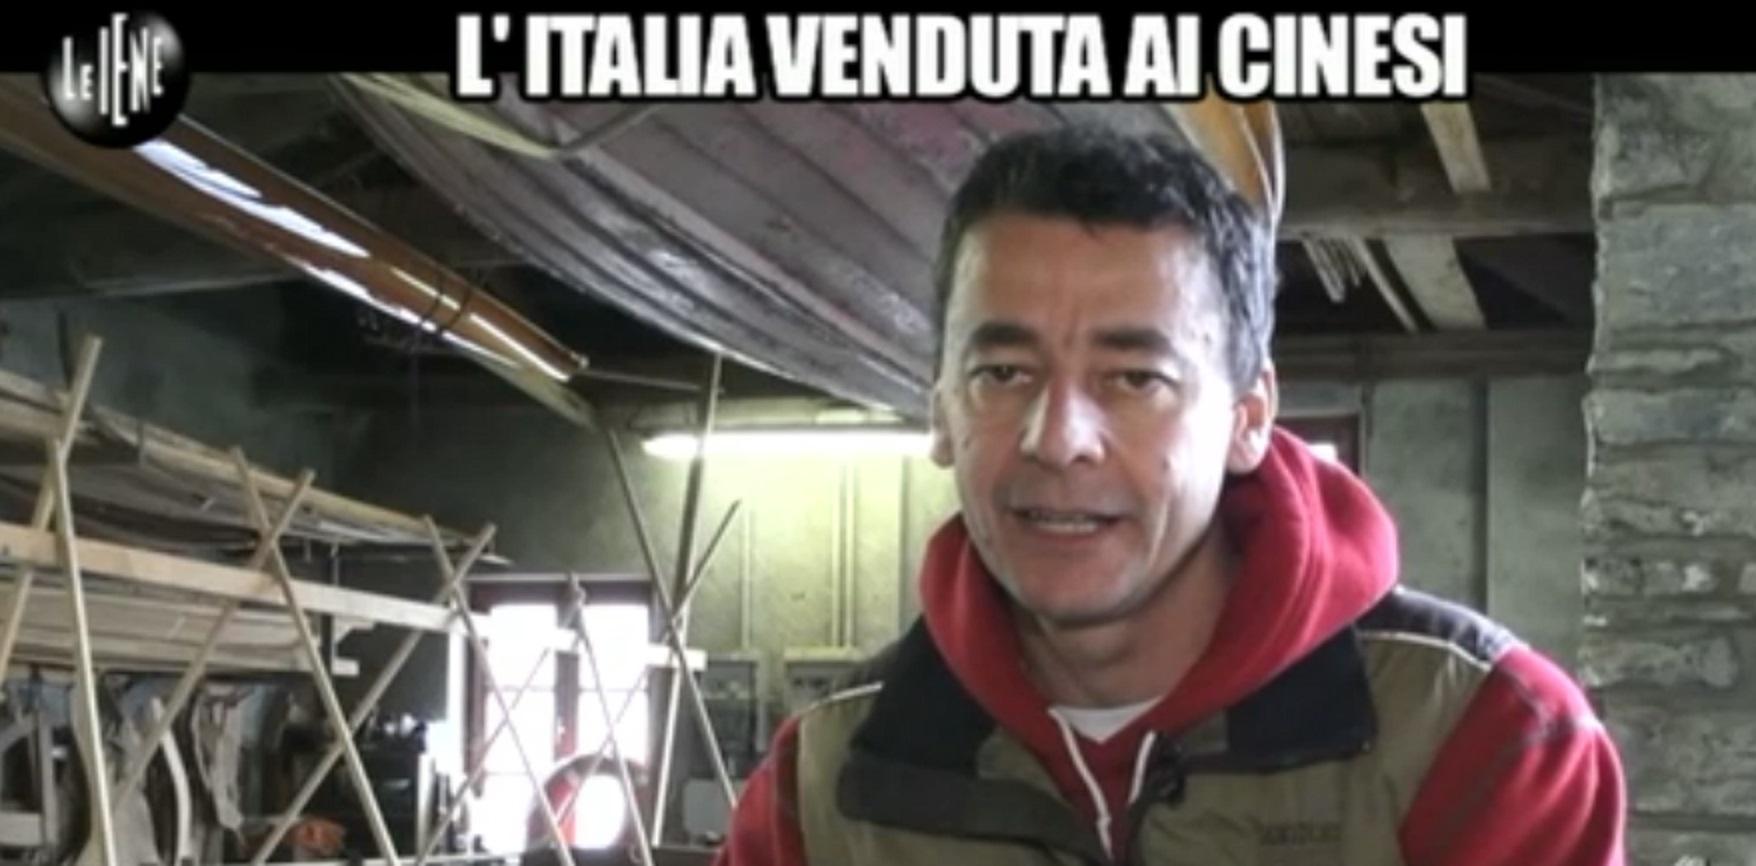 Iena10